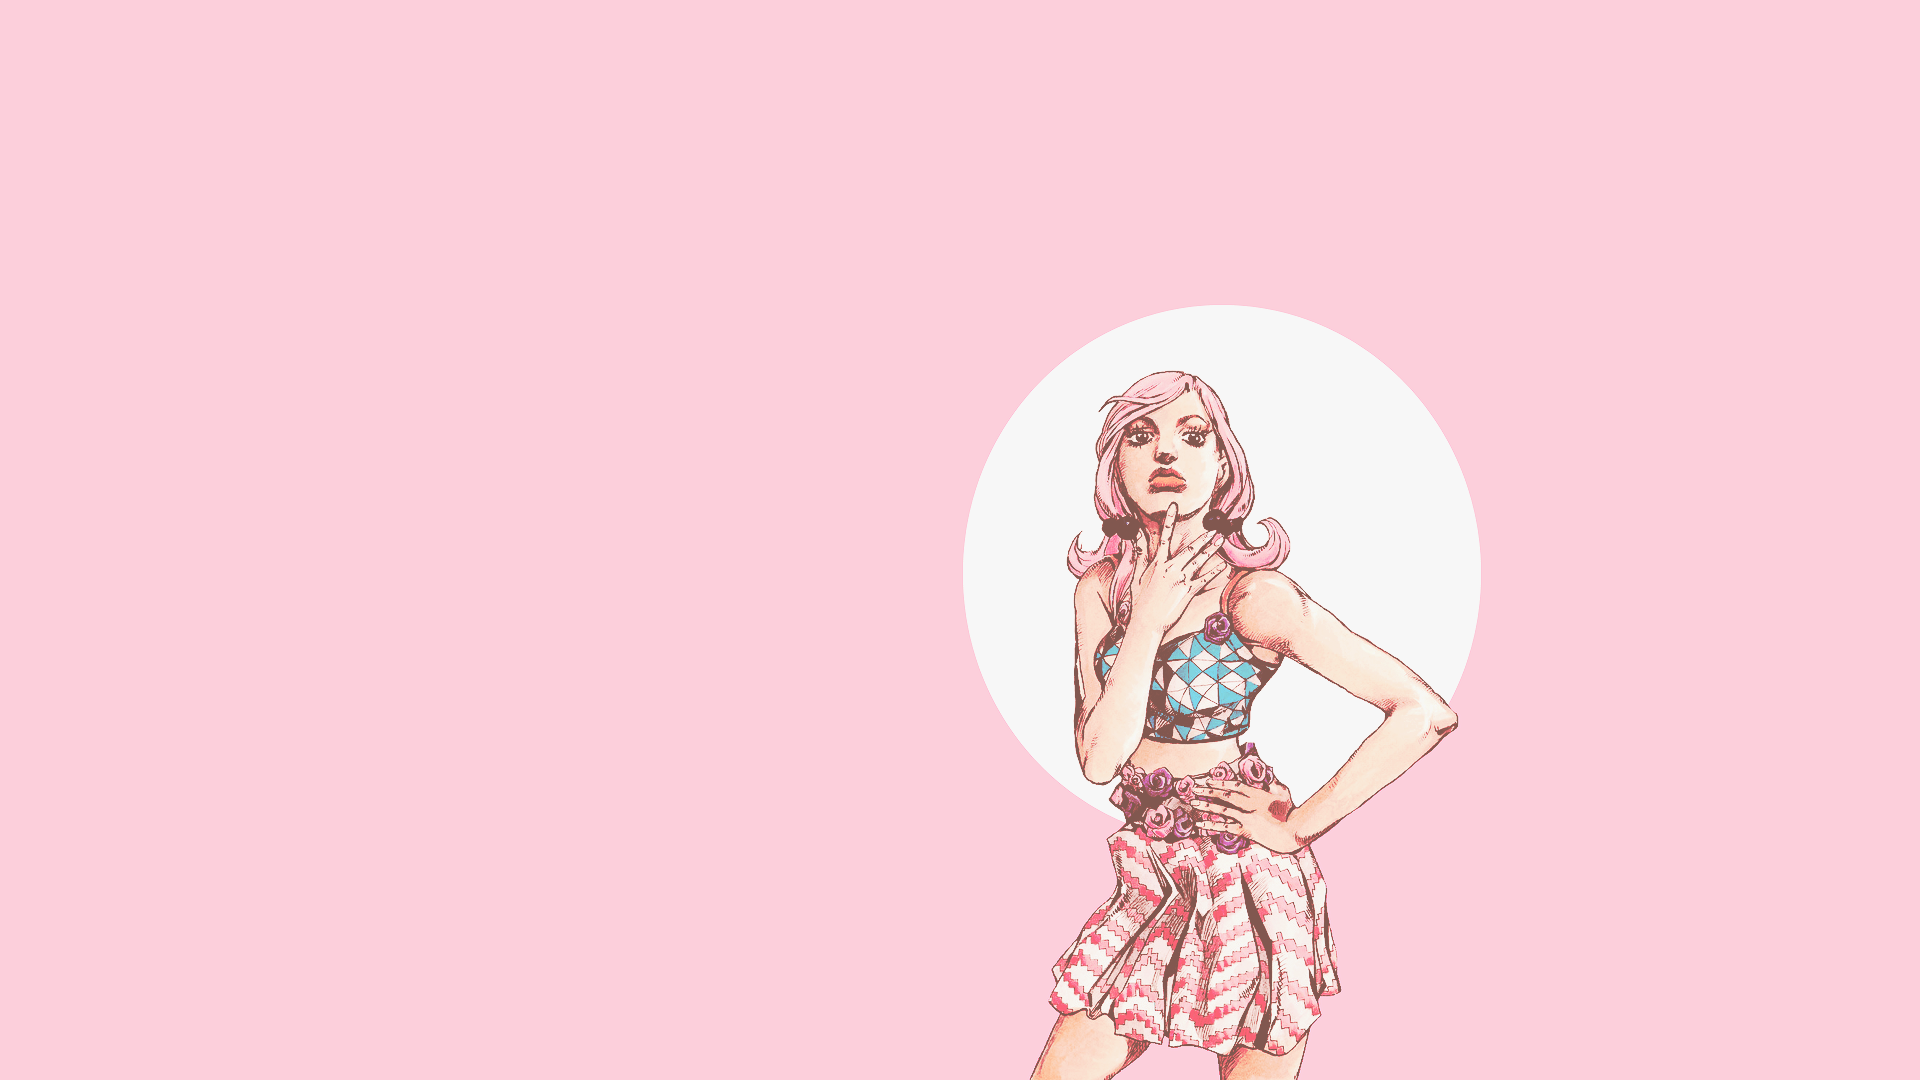 ᴛʀɪsʜ ᴜɴᴀ ᴡᴀʟʟᴘᴀᴘᴇʀ Jojo Anime Jojo Bizarre Anime Wallpaper